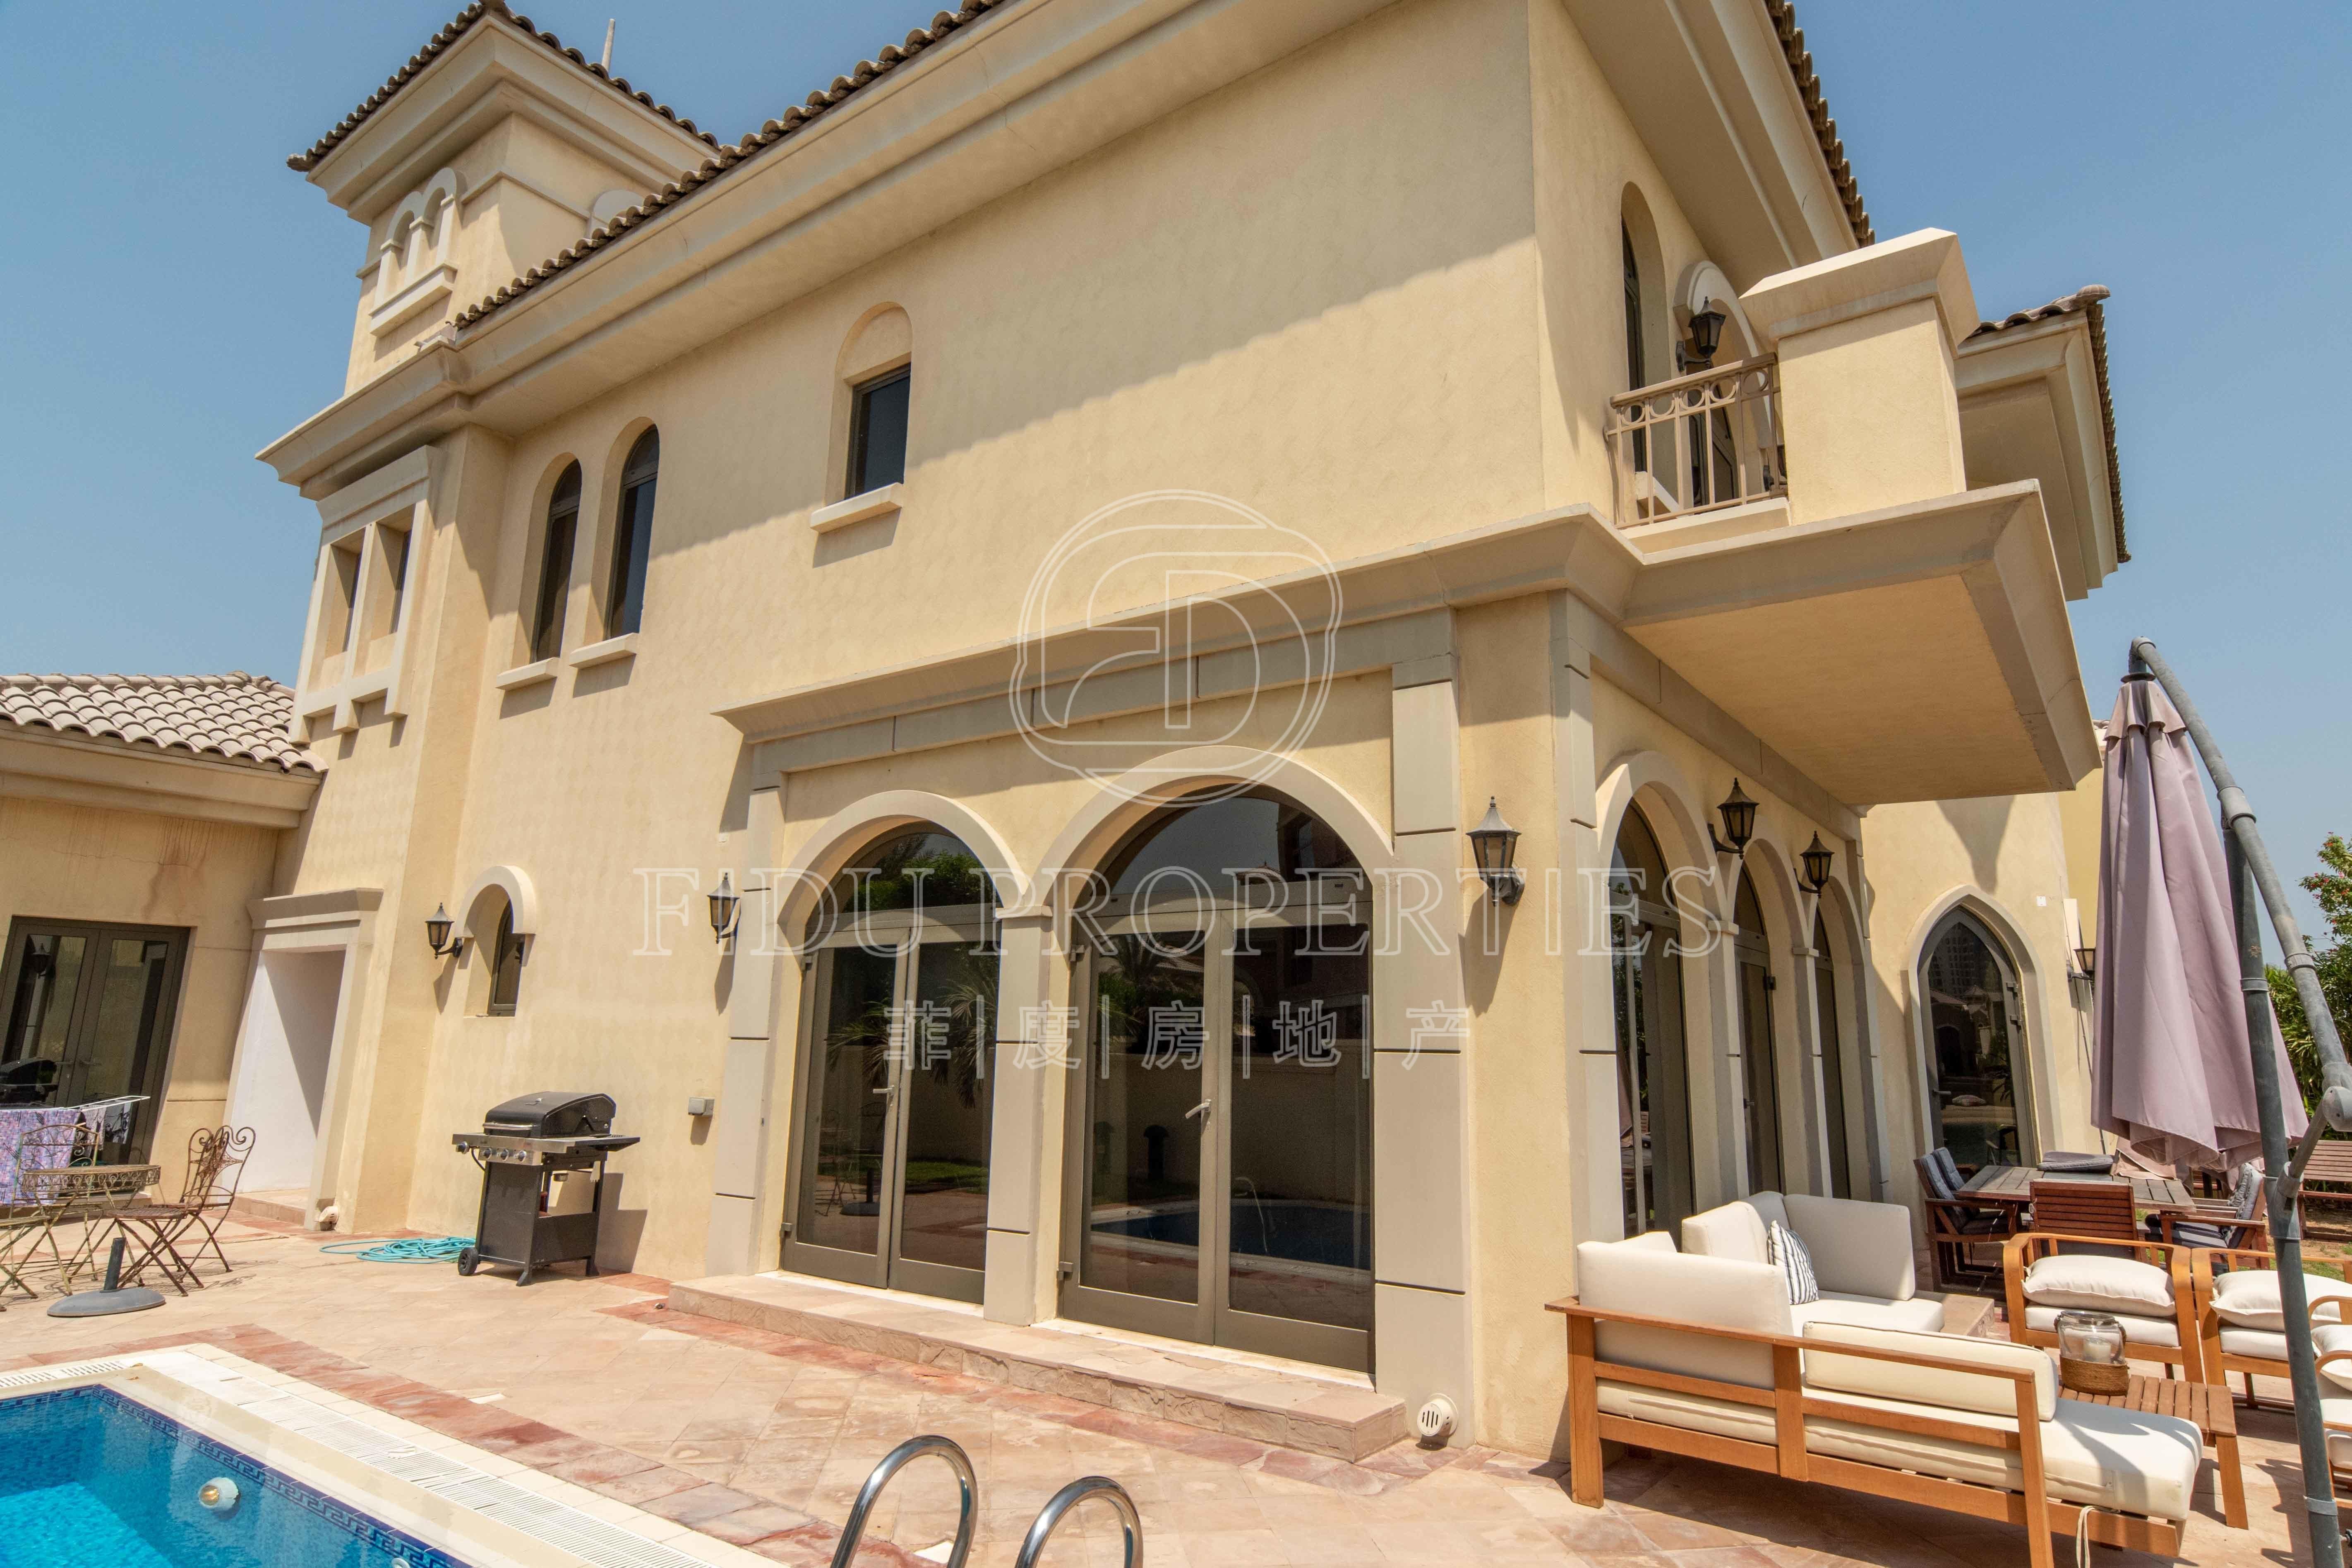 Burj Al Arab View | Atrium Ent...